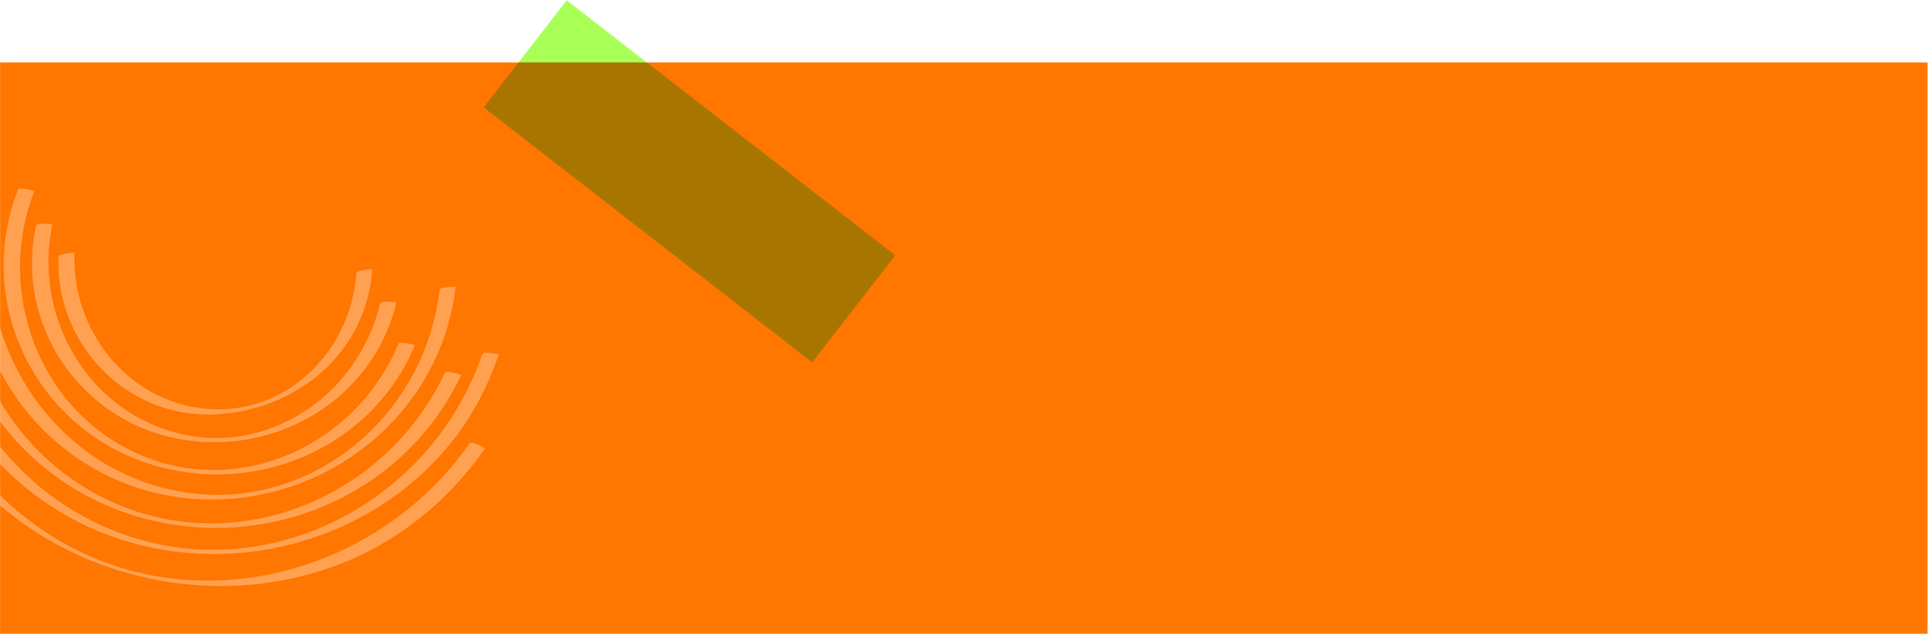 rettangolo03